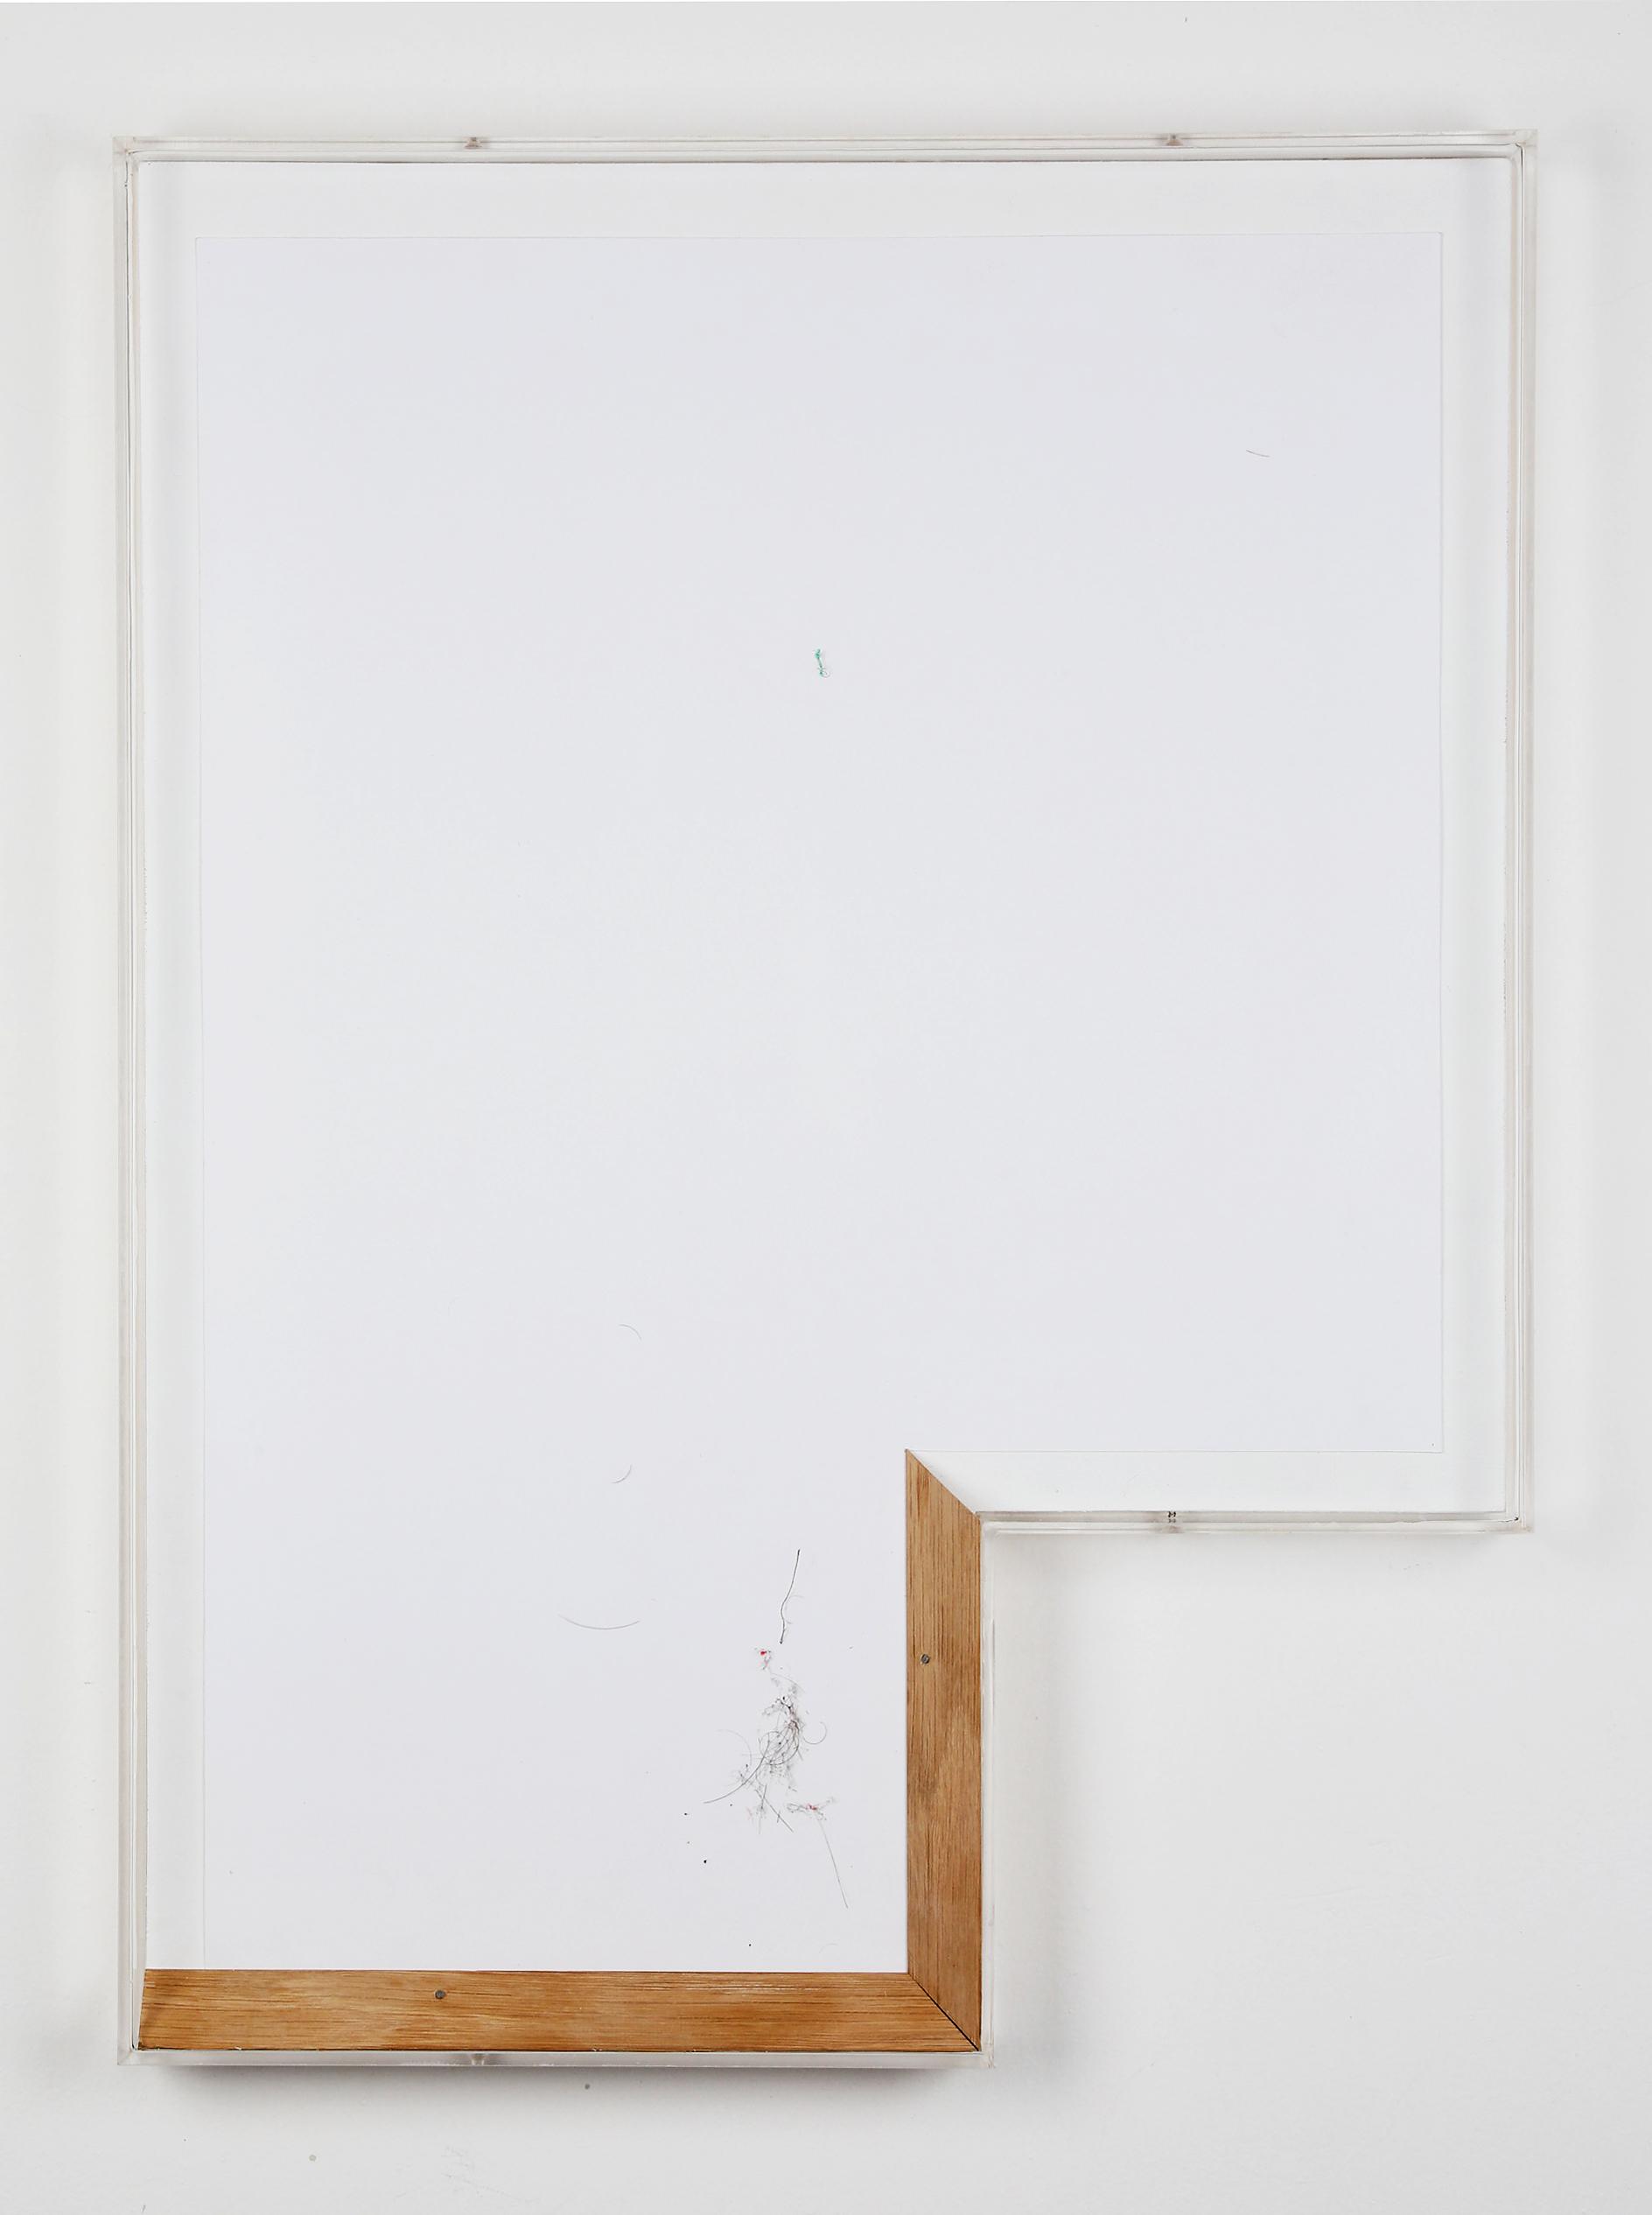 Michail-Michailov-dust-to-dust-29-2016_coloured-pencil-on-paper-46-x-64-cm-